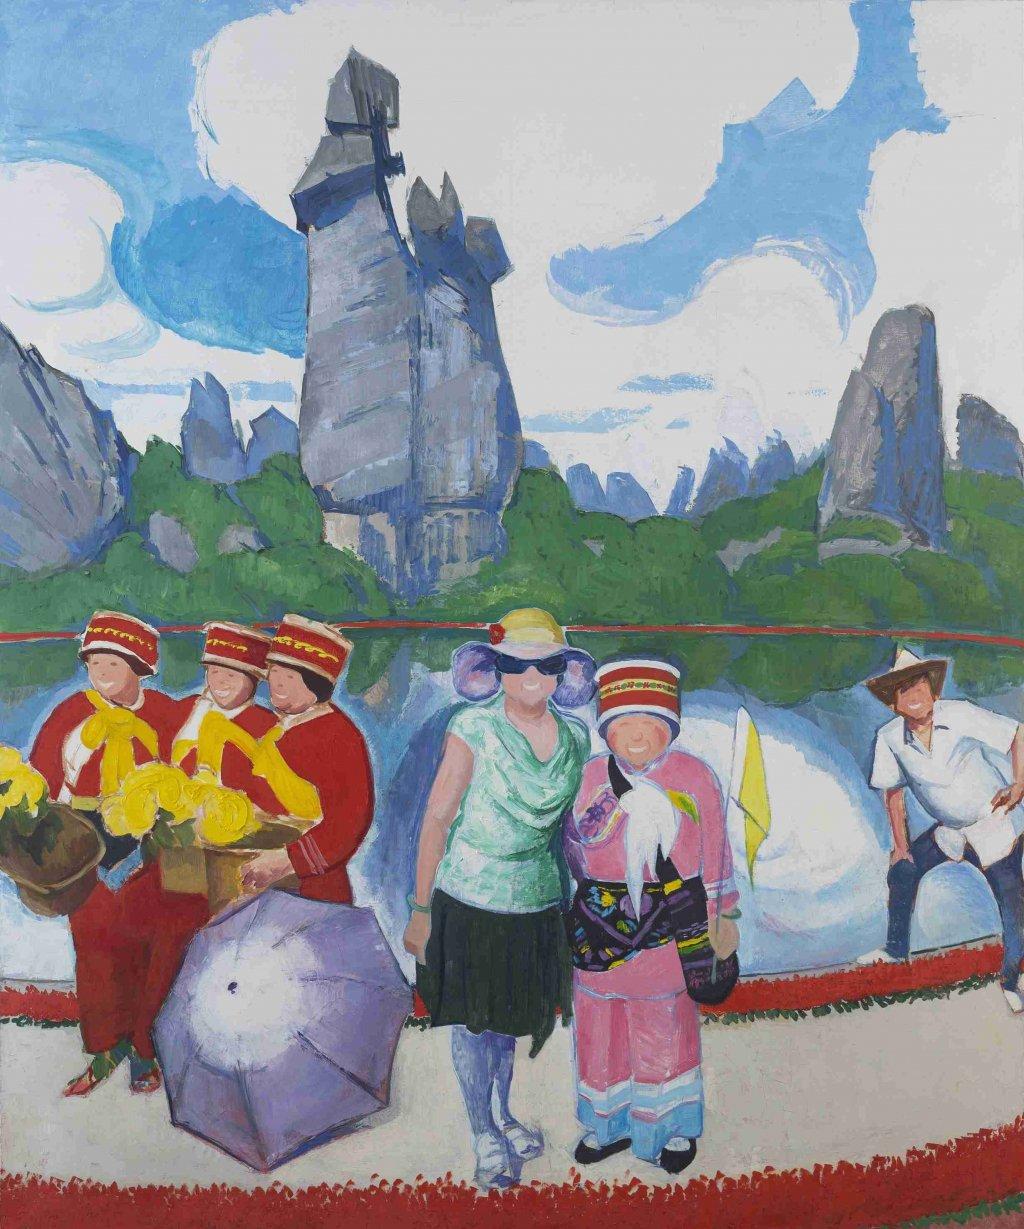 Huang Yu art collection